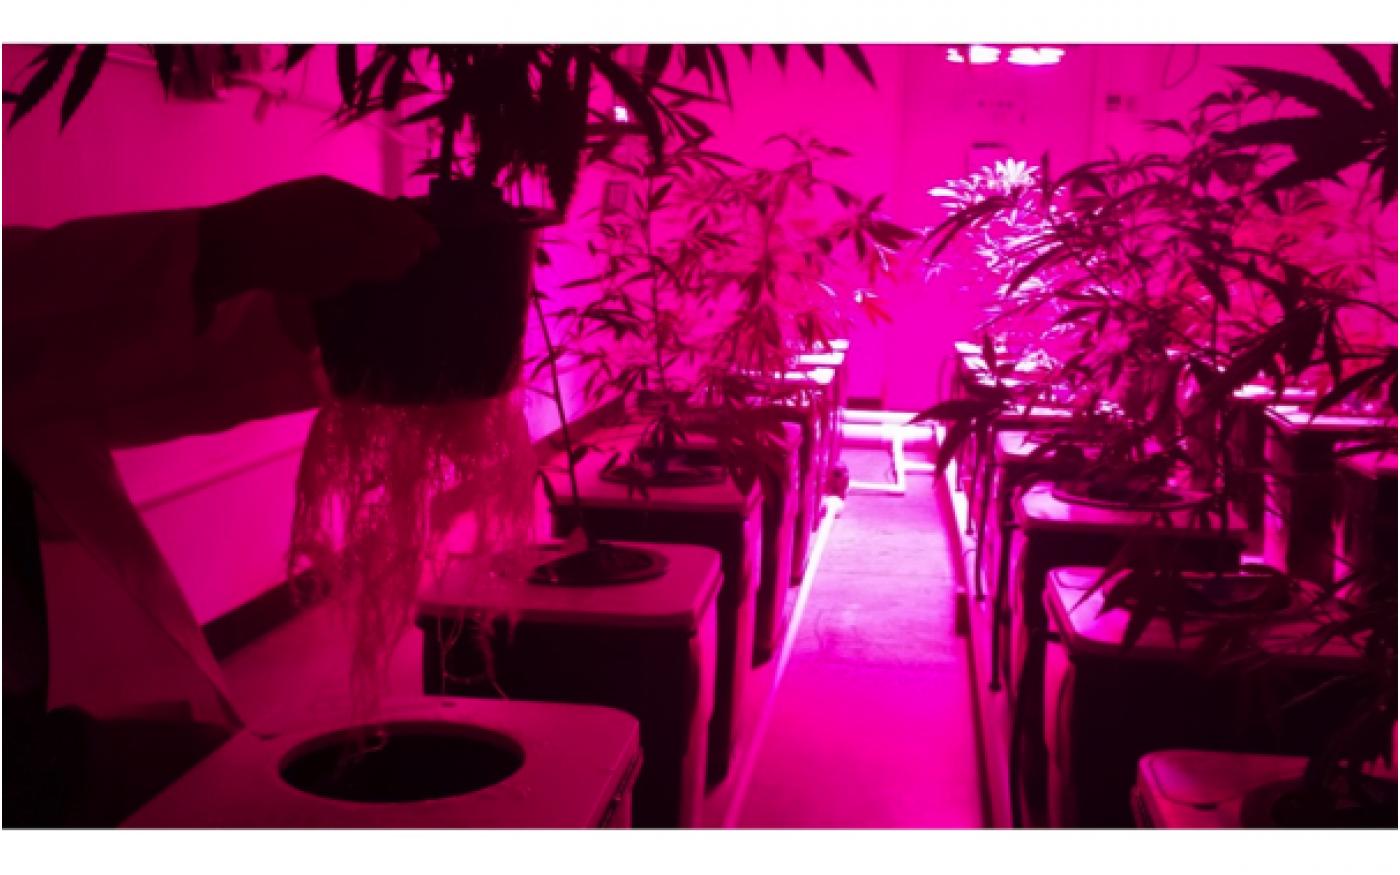 Pink lights in cannabis grow room